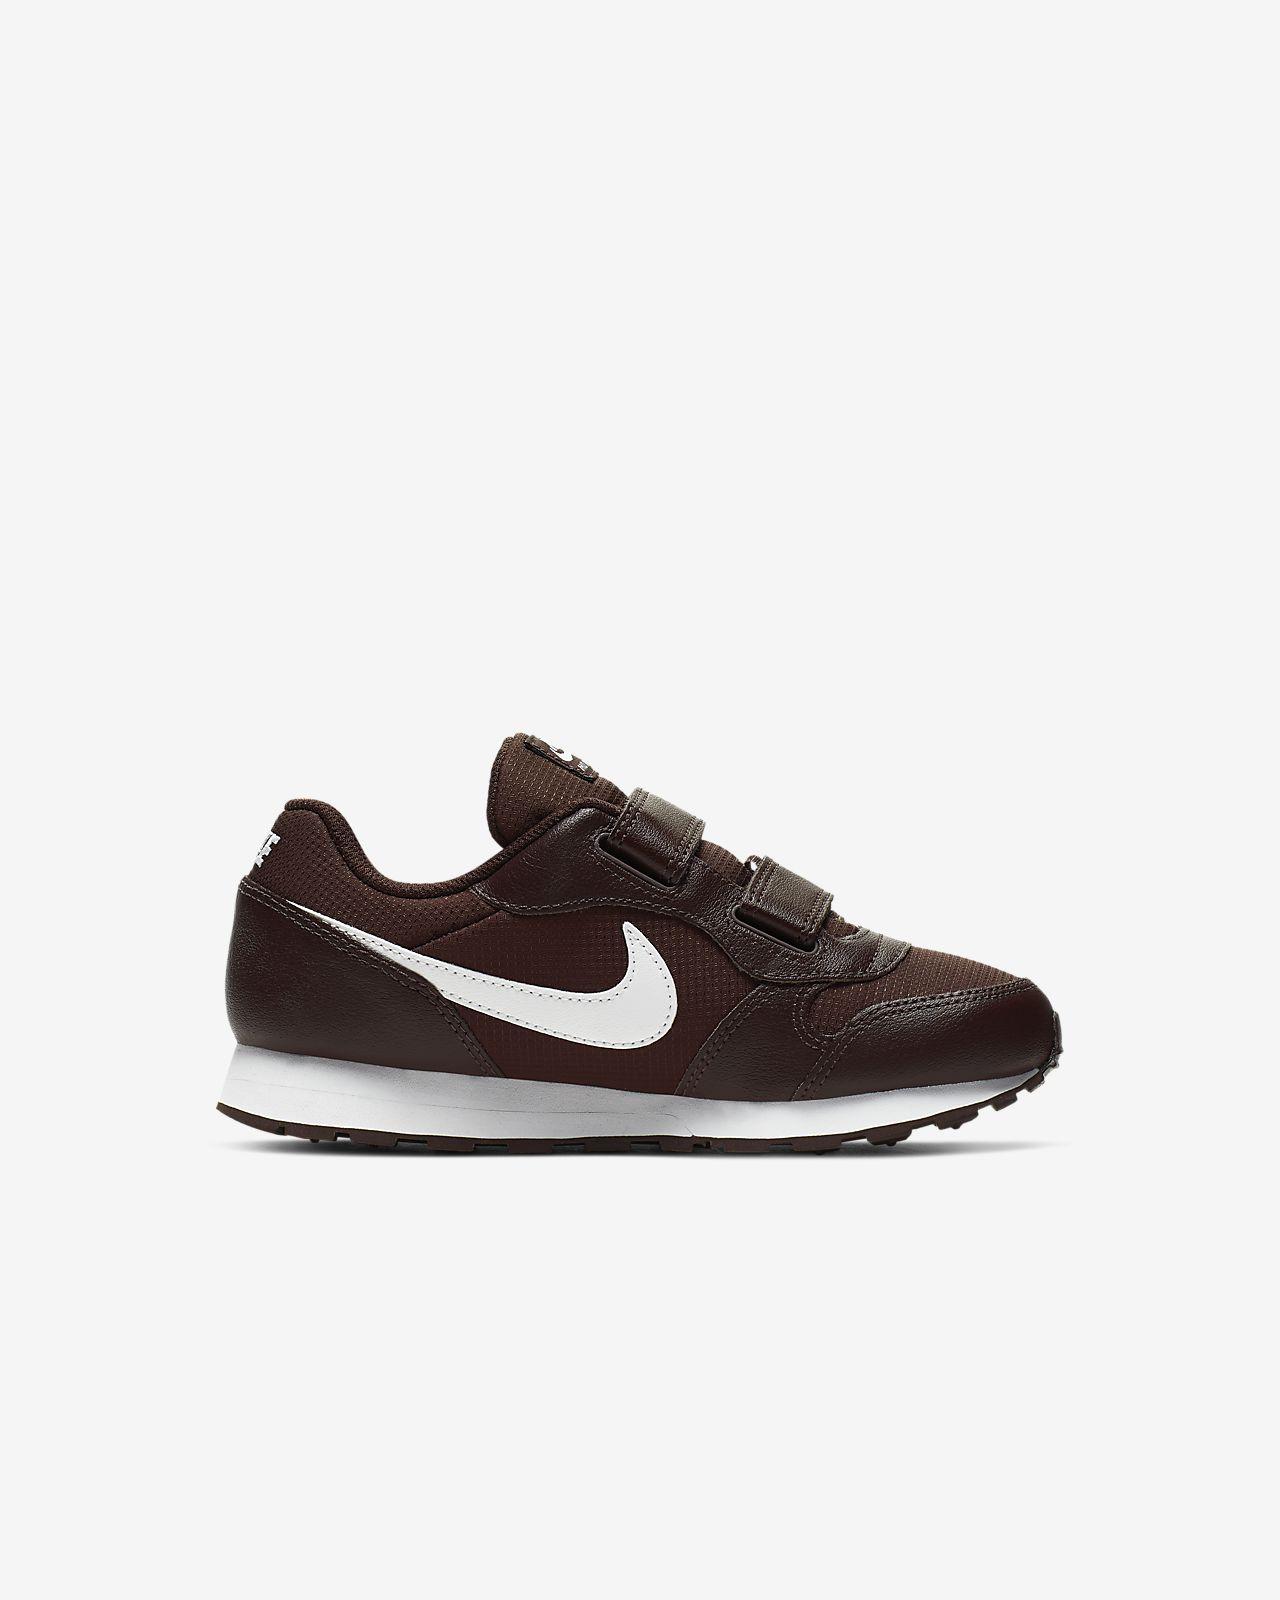 Nike Air Max Tavas GråHvid →【Lave Sneakers på Sportamore】